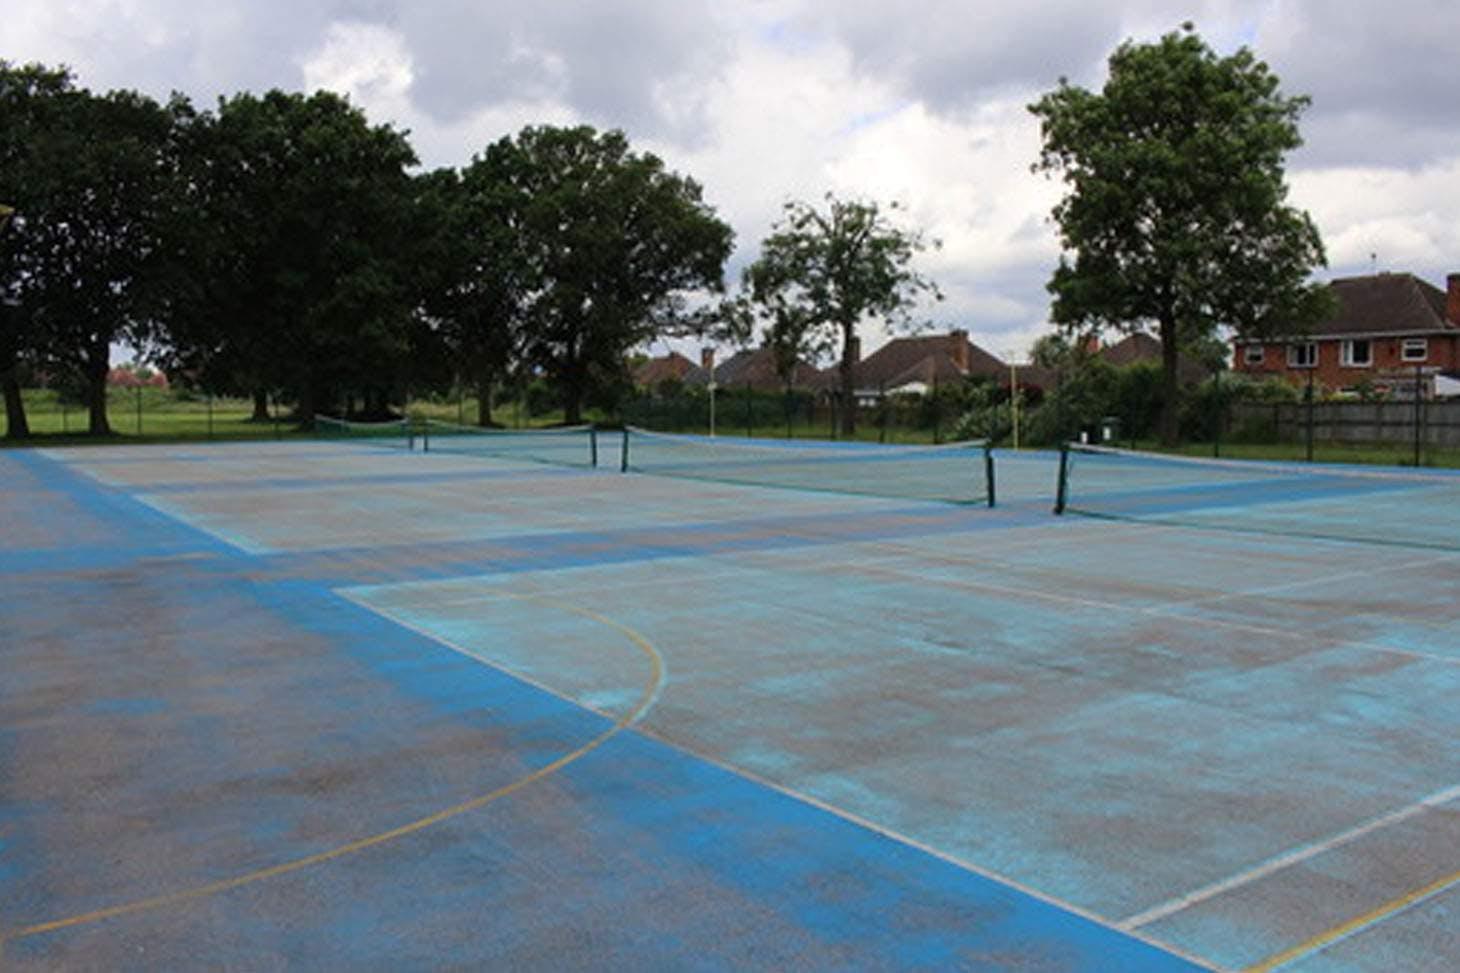 Light Hall School Outdoor | Hard (macadam) tennis court